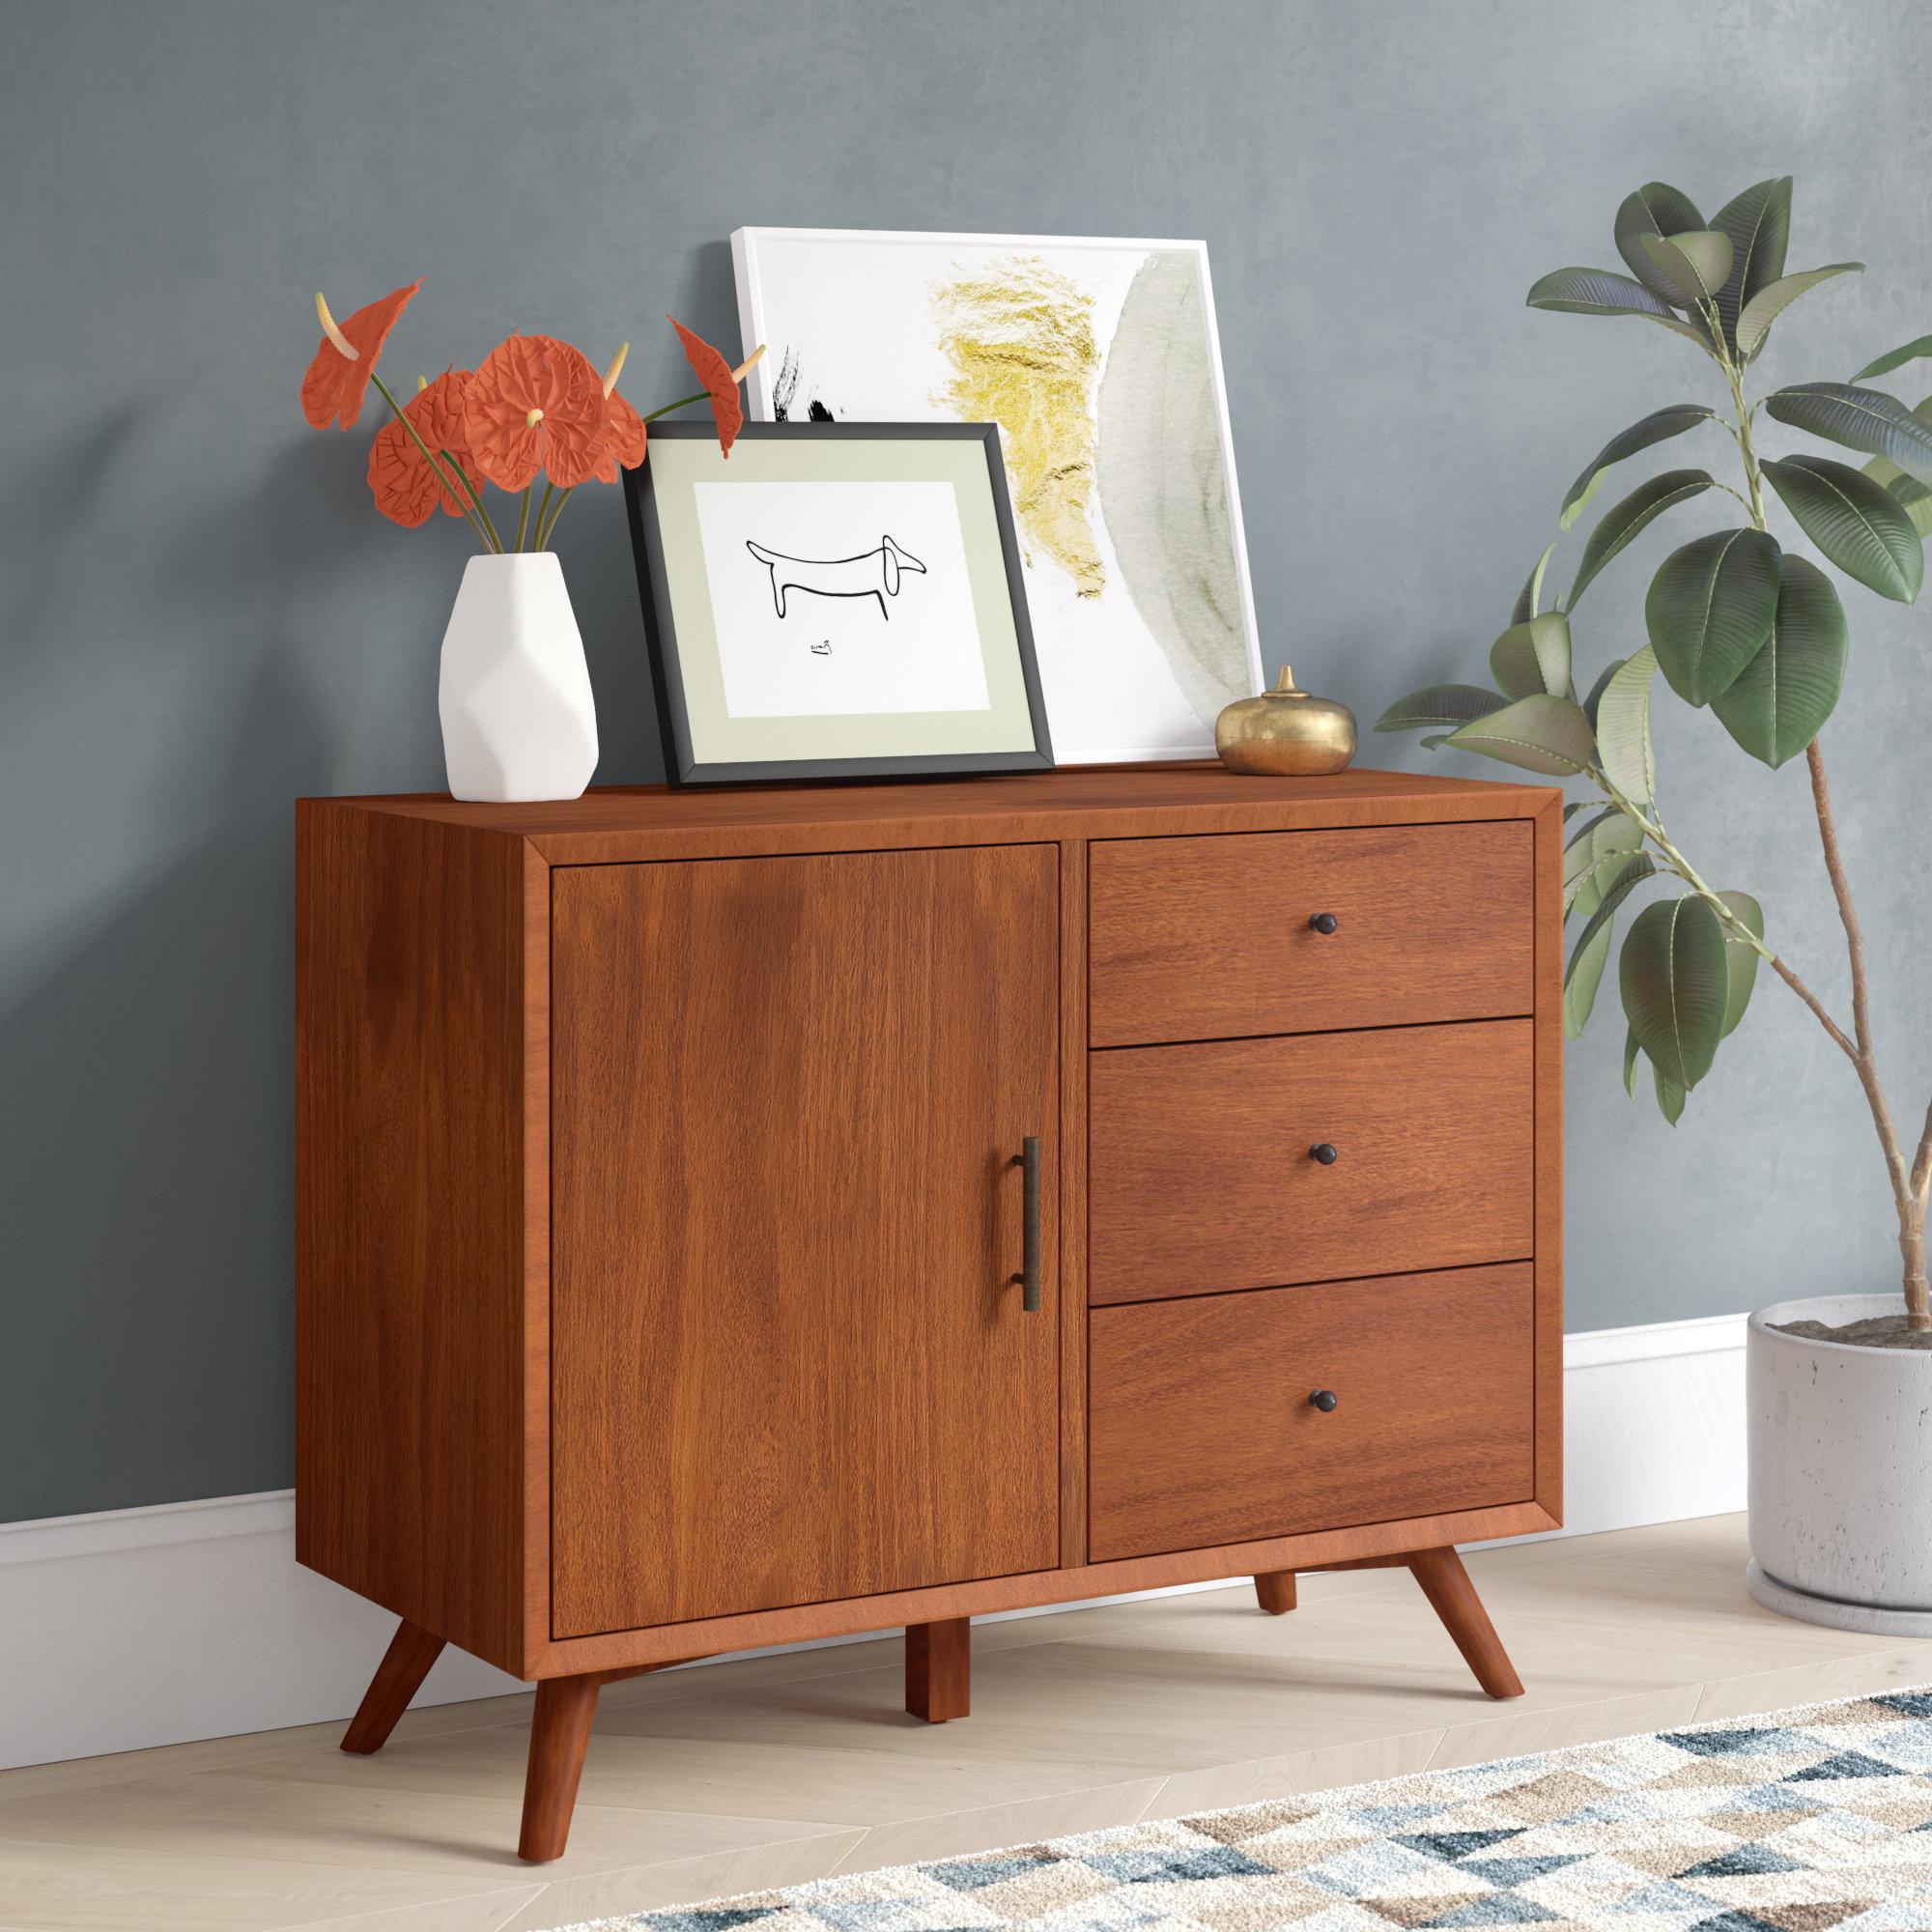 3 Drawer Sideboard | Wayfair For Drummond 3 Drawer Sideboards (Gallery 9 of 20)